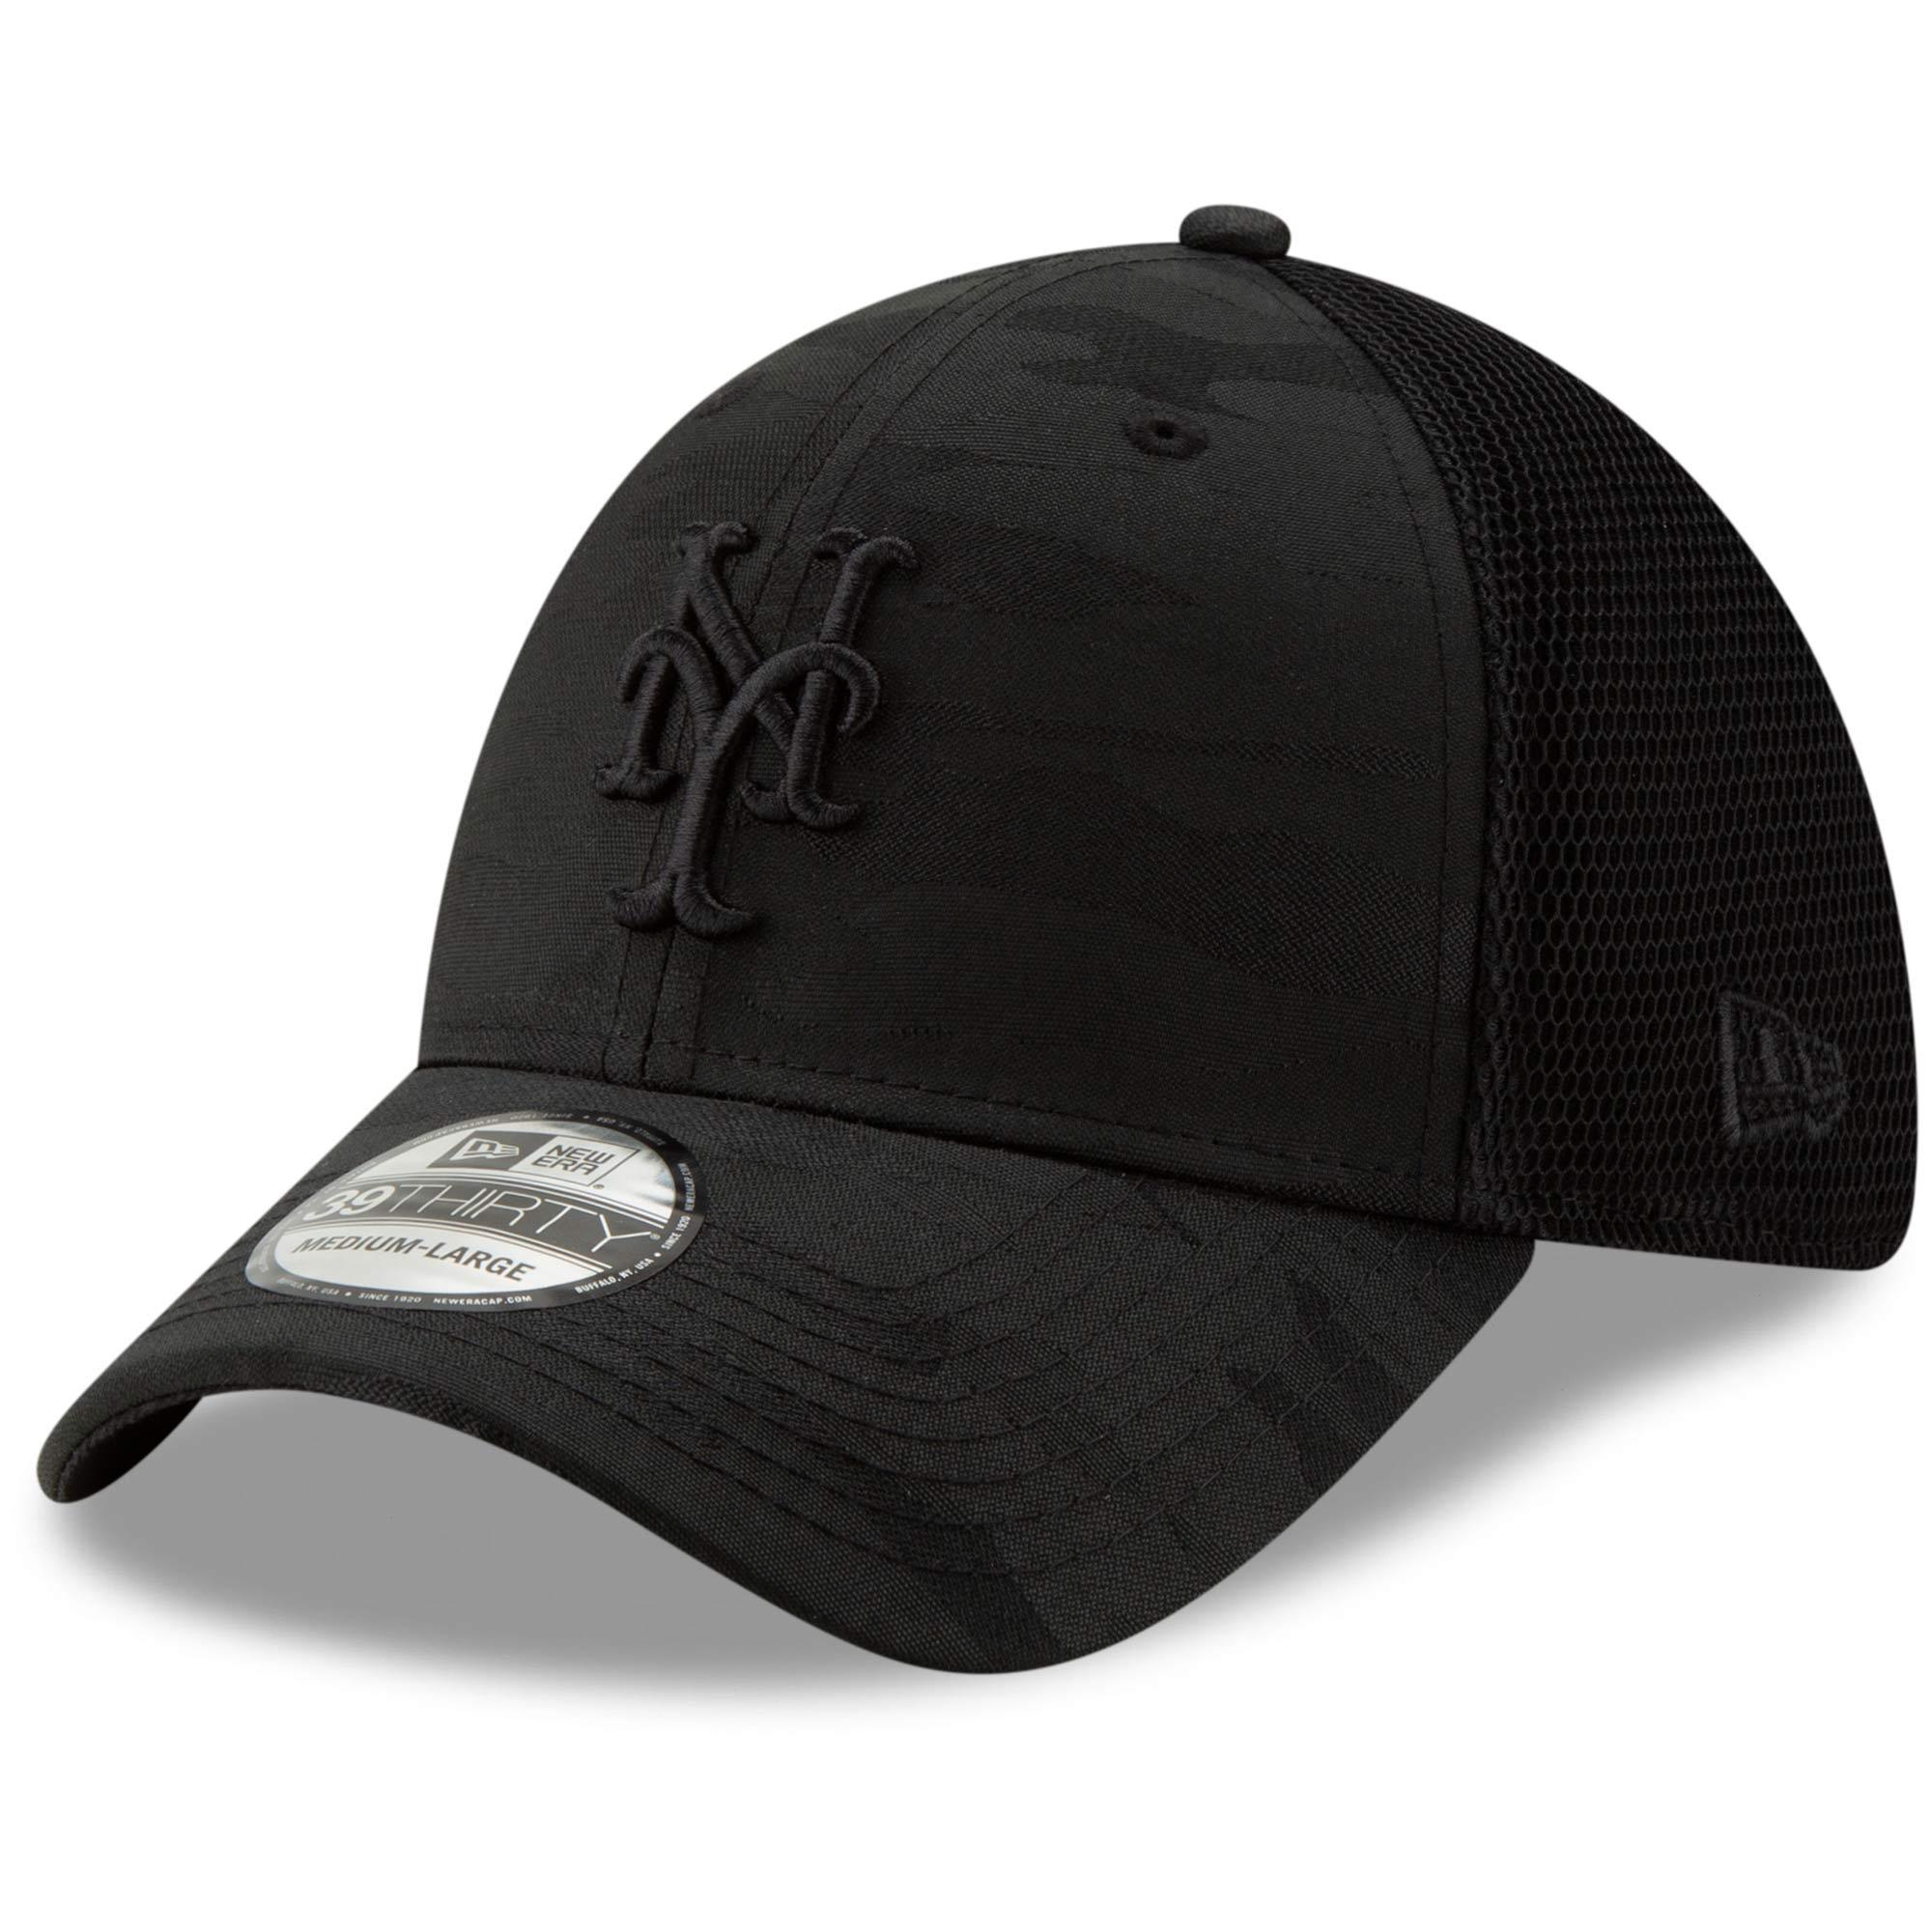 New York Mets New Era Camo Front Neo 39THIRTY Flex Hat - Black